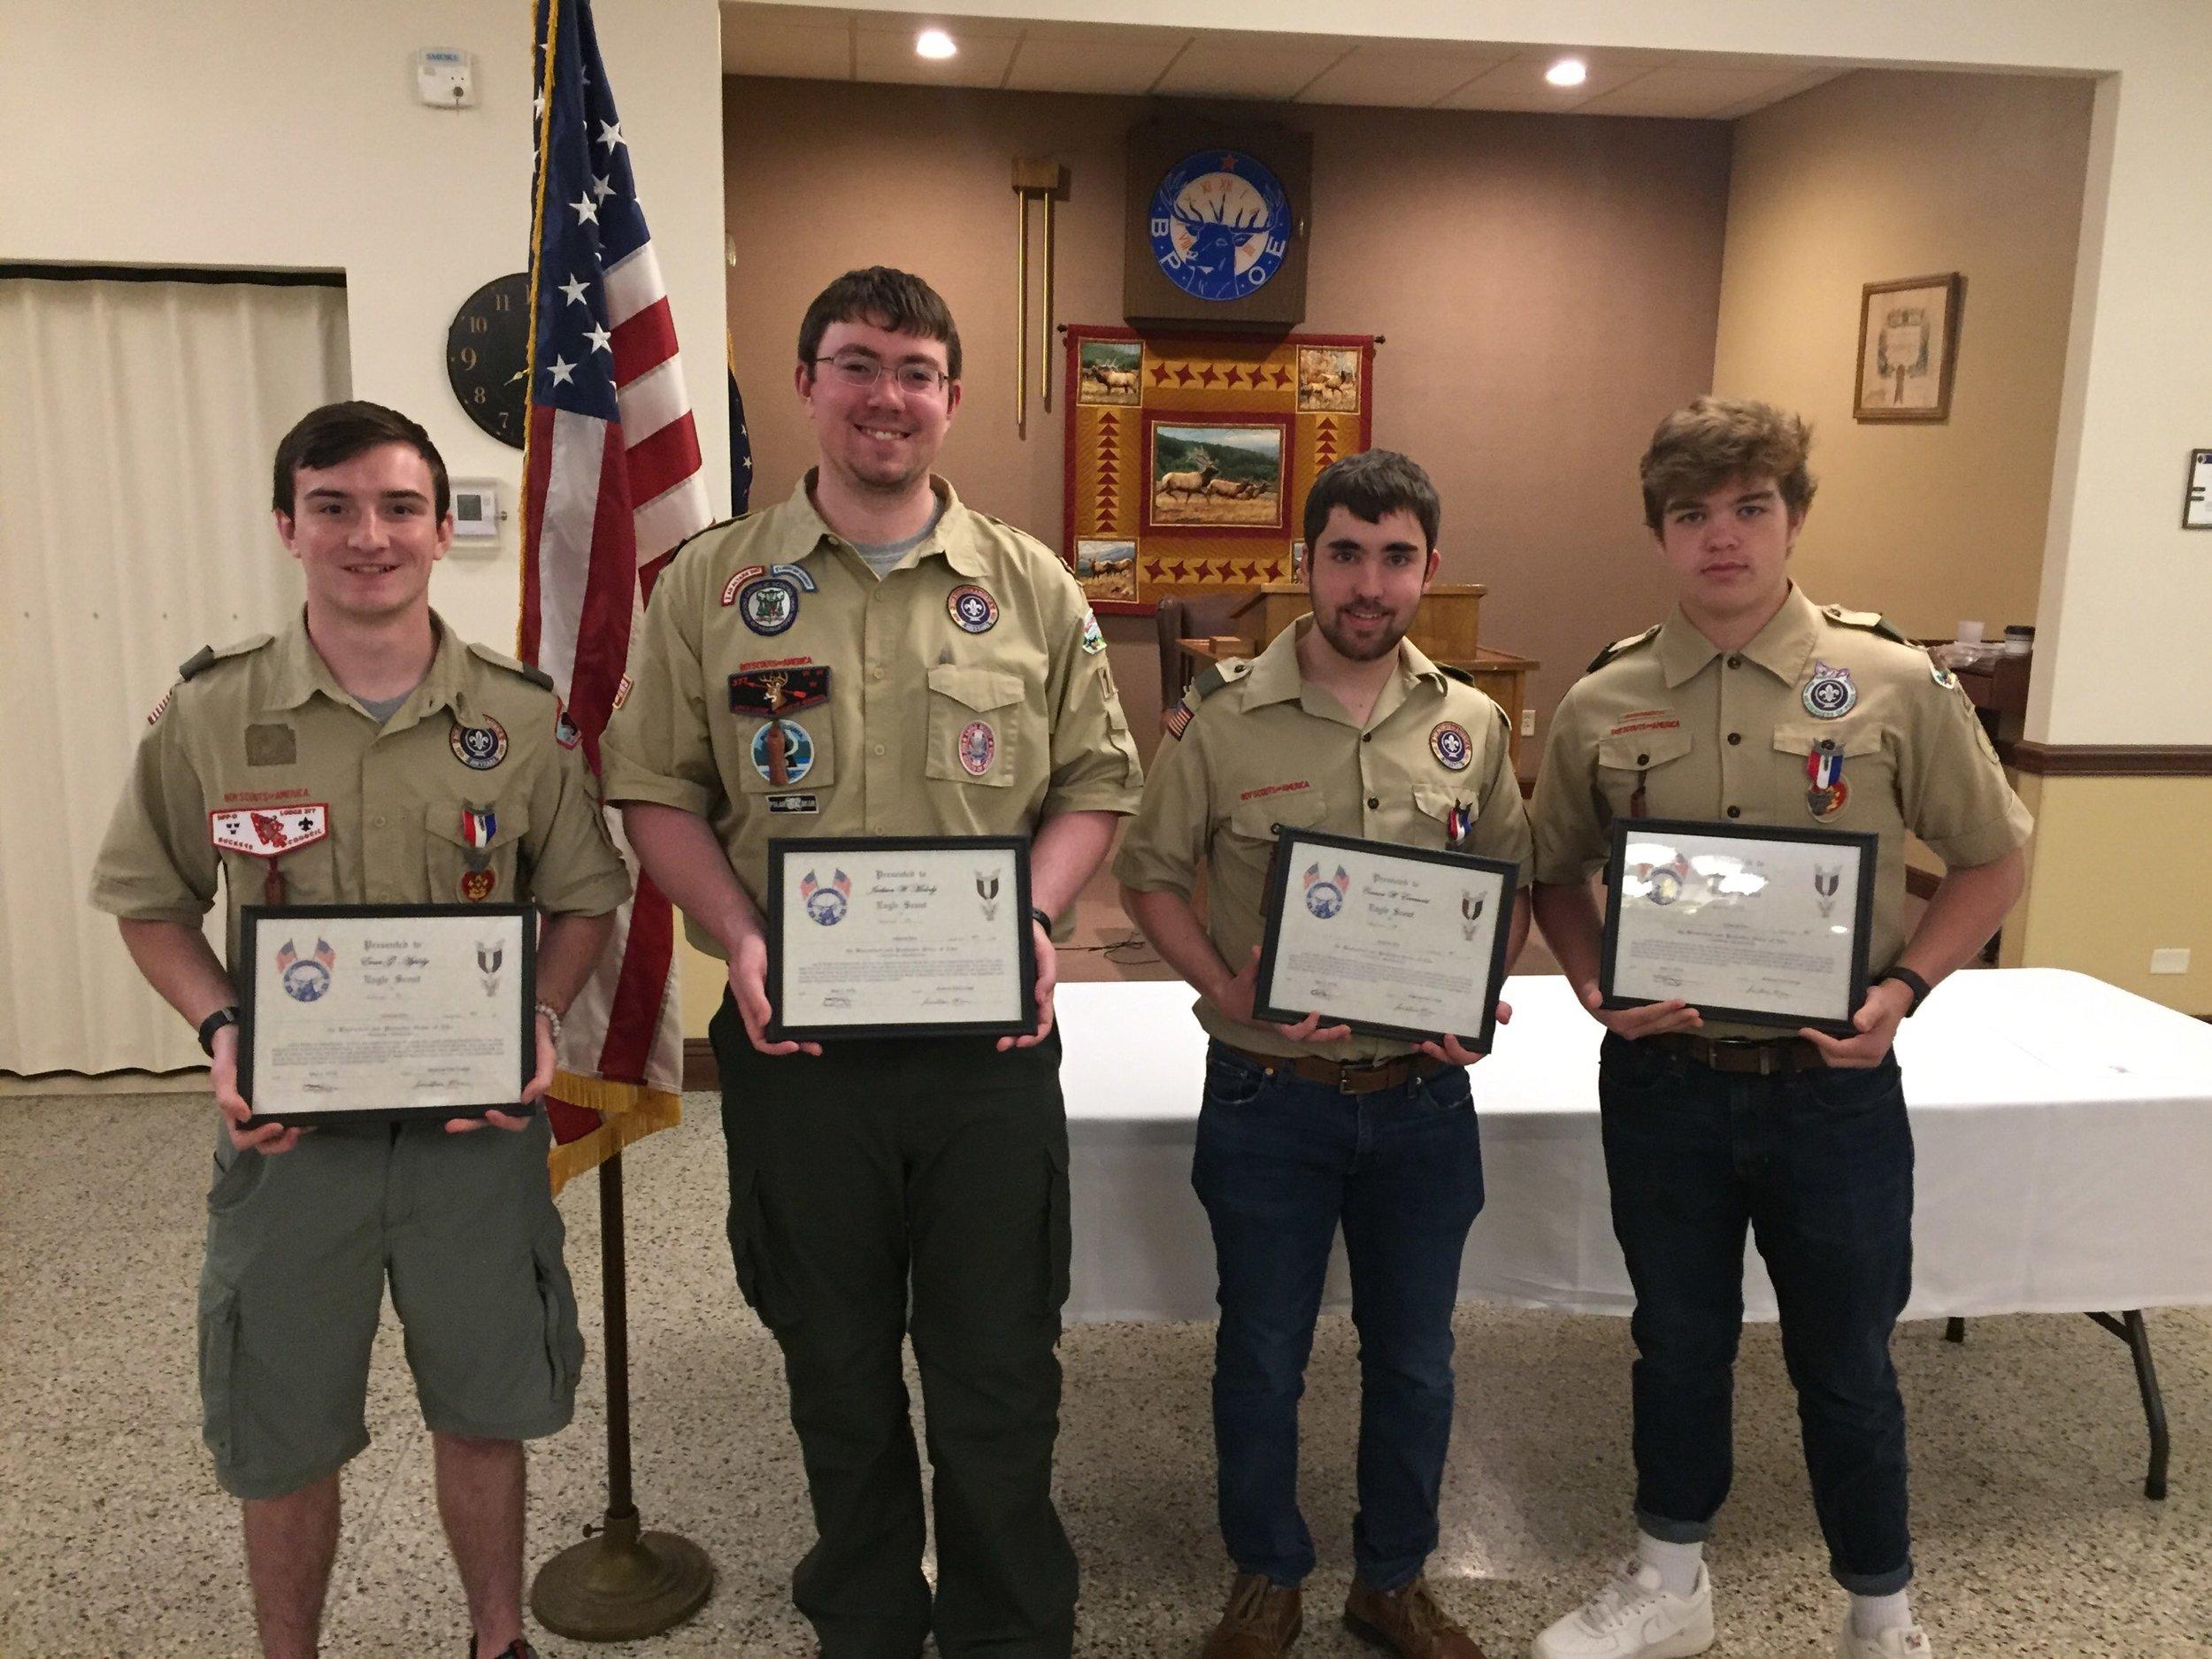 Eagle Scouts--Evan Appleby, Jackson Molody, Connor Ecrement, Brady Mohr